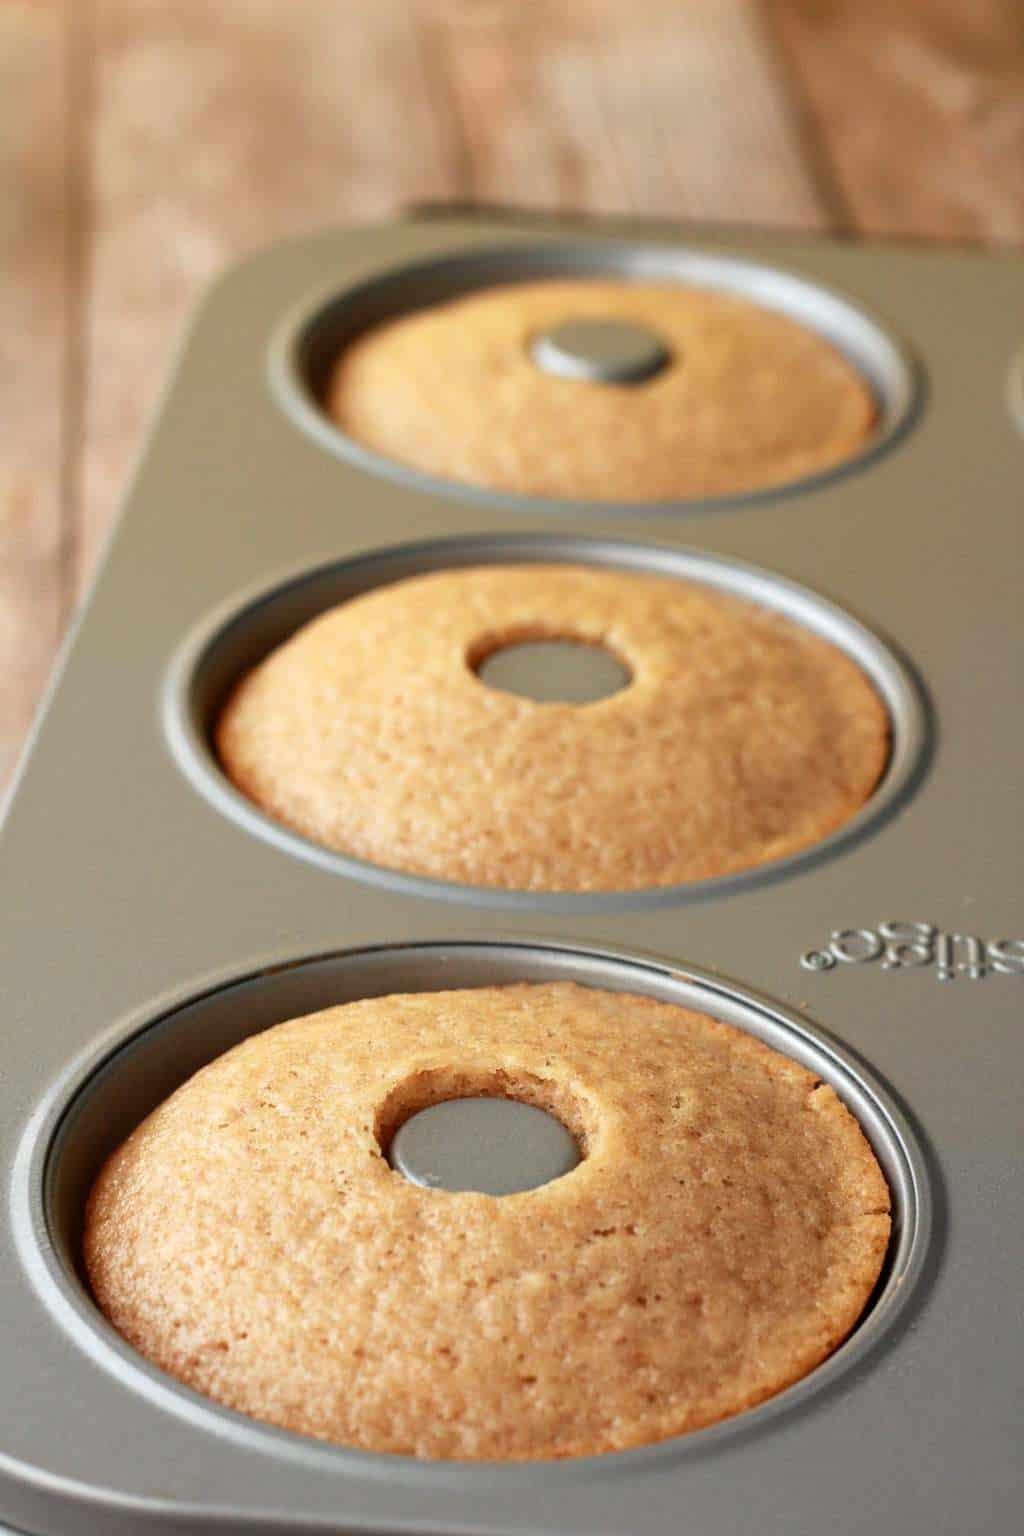 Making Baked Vegan Donuts #vegan #lovingitvegan #donuts #dessert